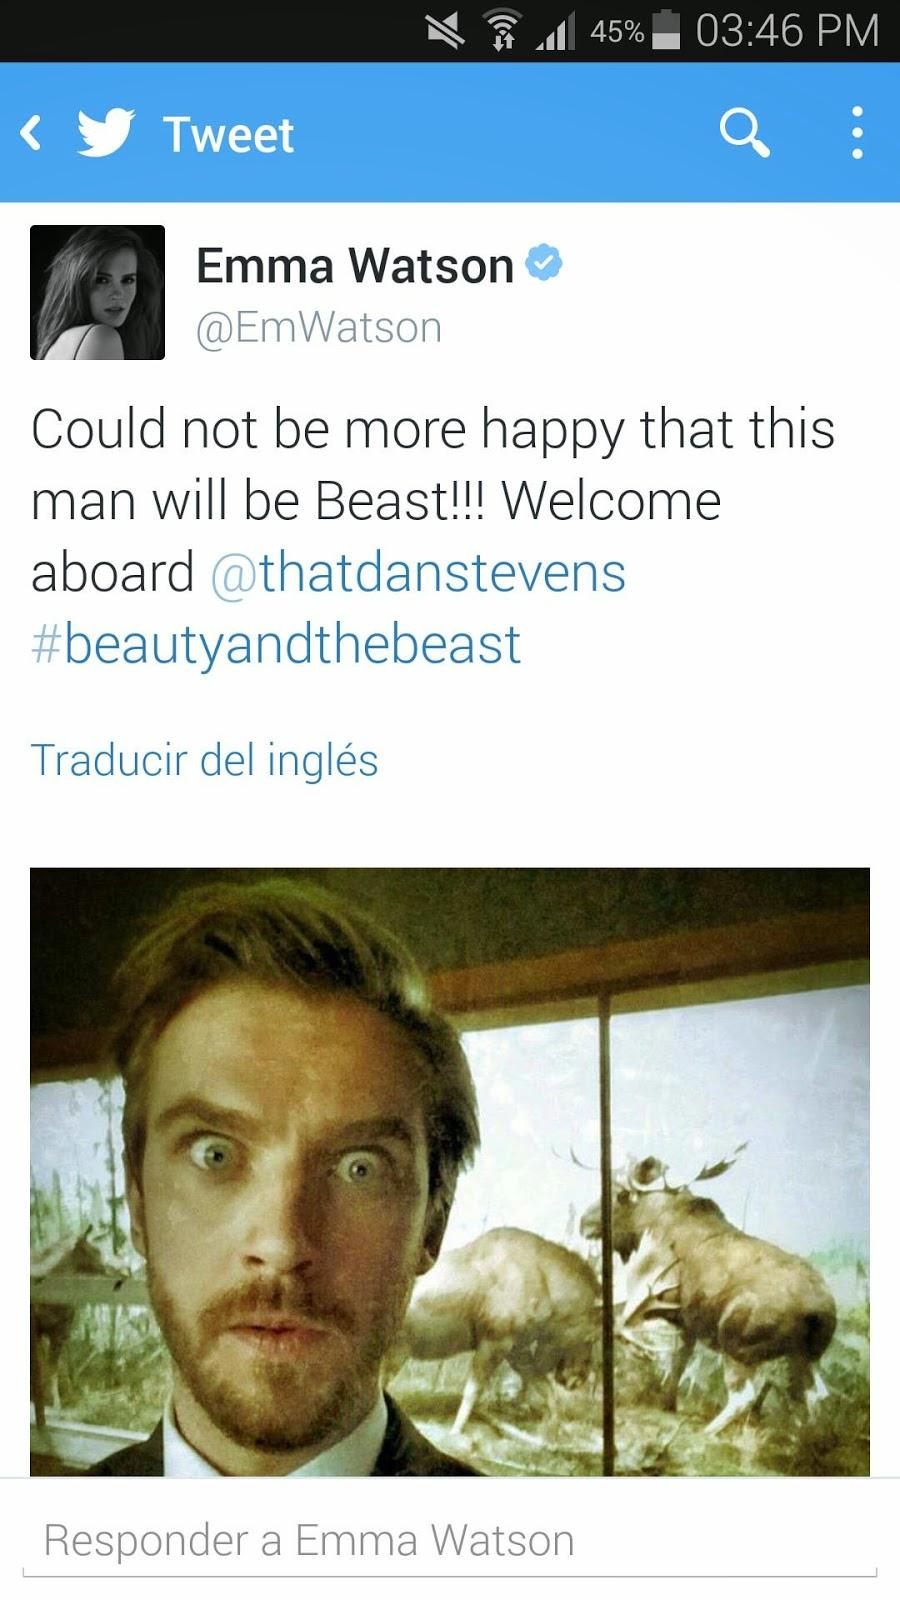 Tweet anunciando a Dan Stevens como la Bestia